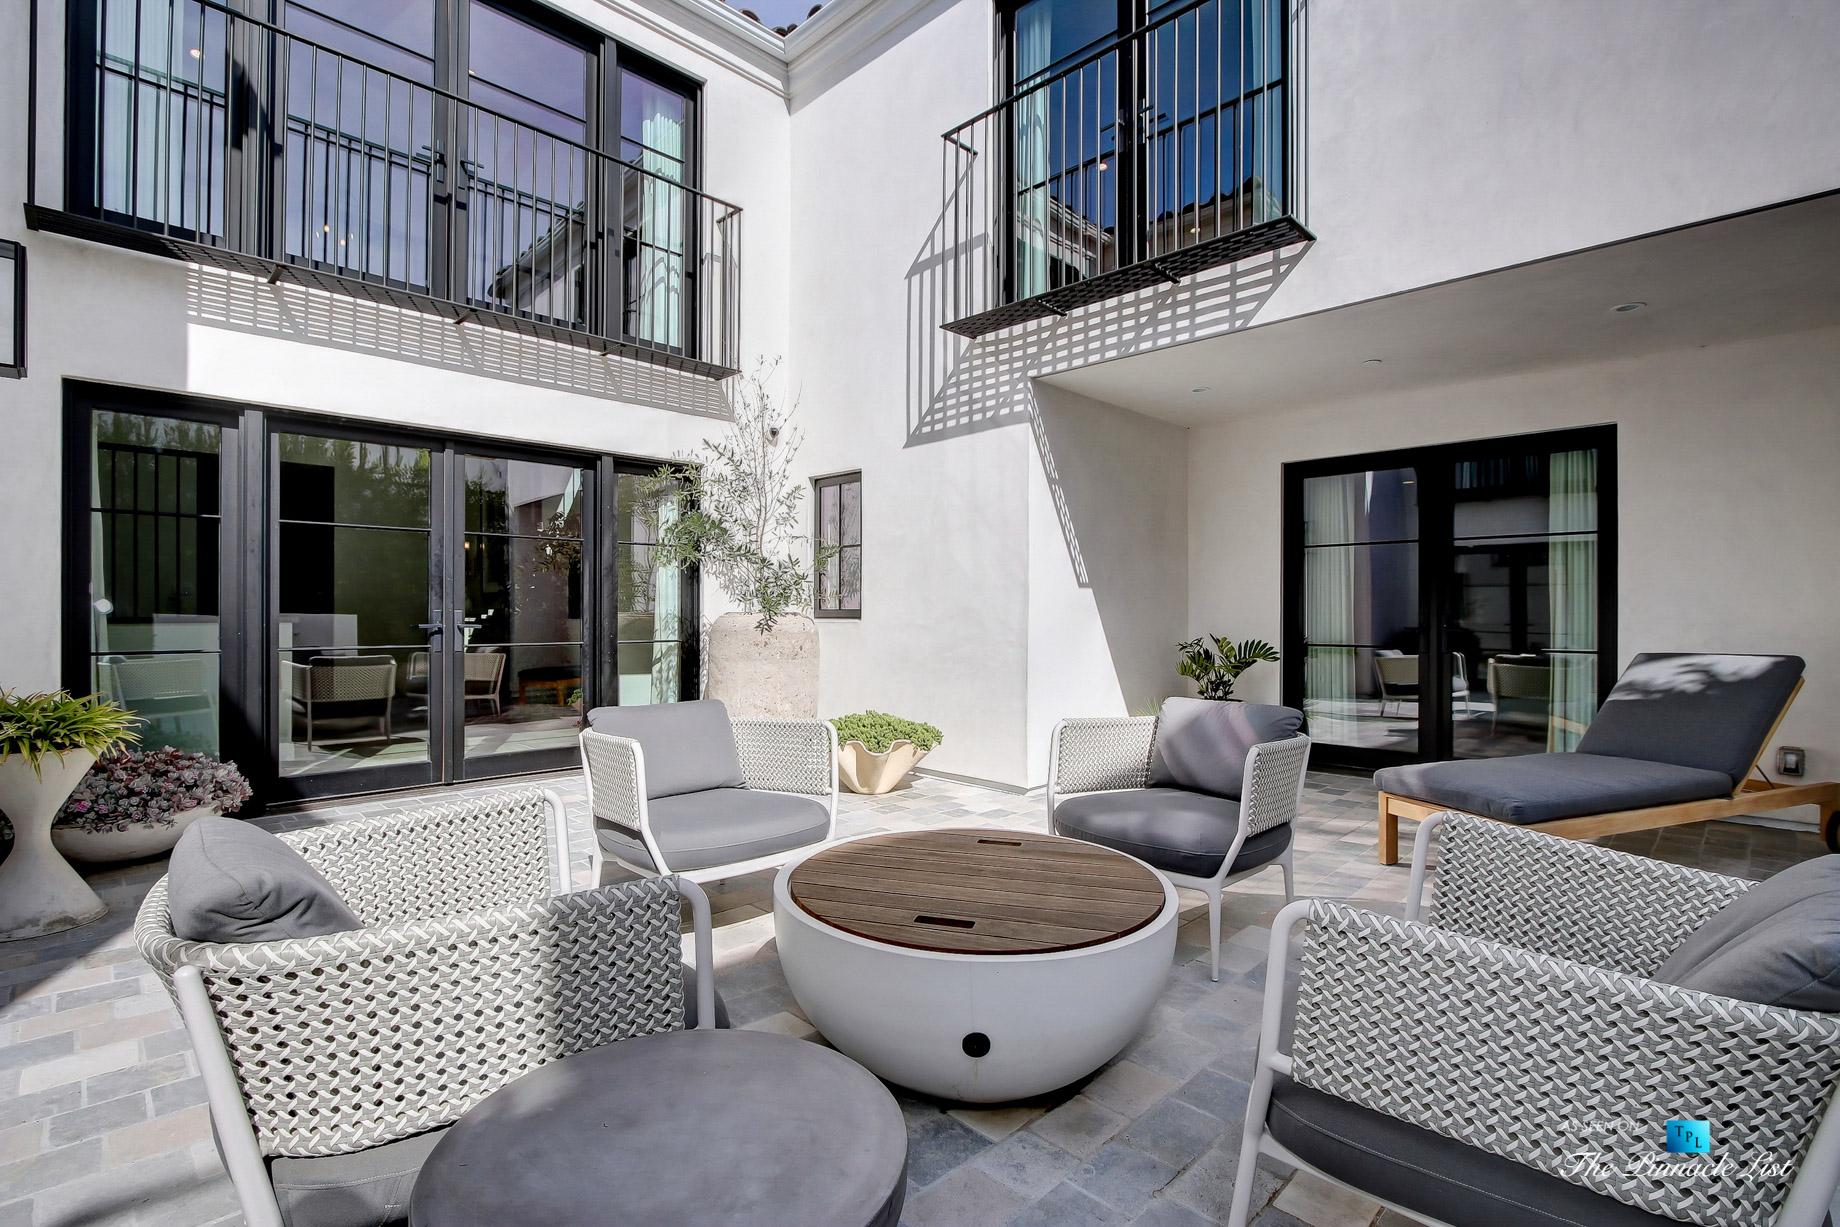 825 Highview Ave, Manhattan Beach, CA, USA – Private Exterior Courtyard – Luxury Real Estate – Modern Spanish Home